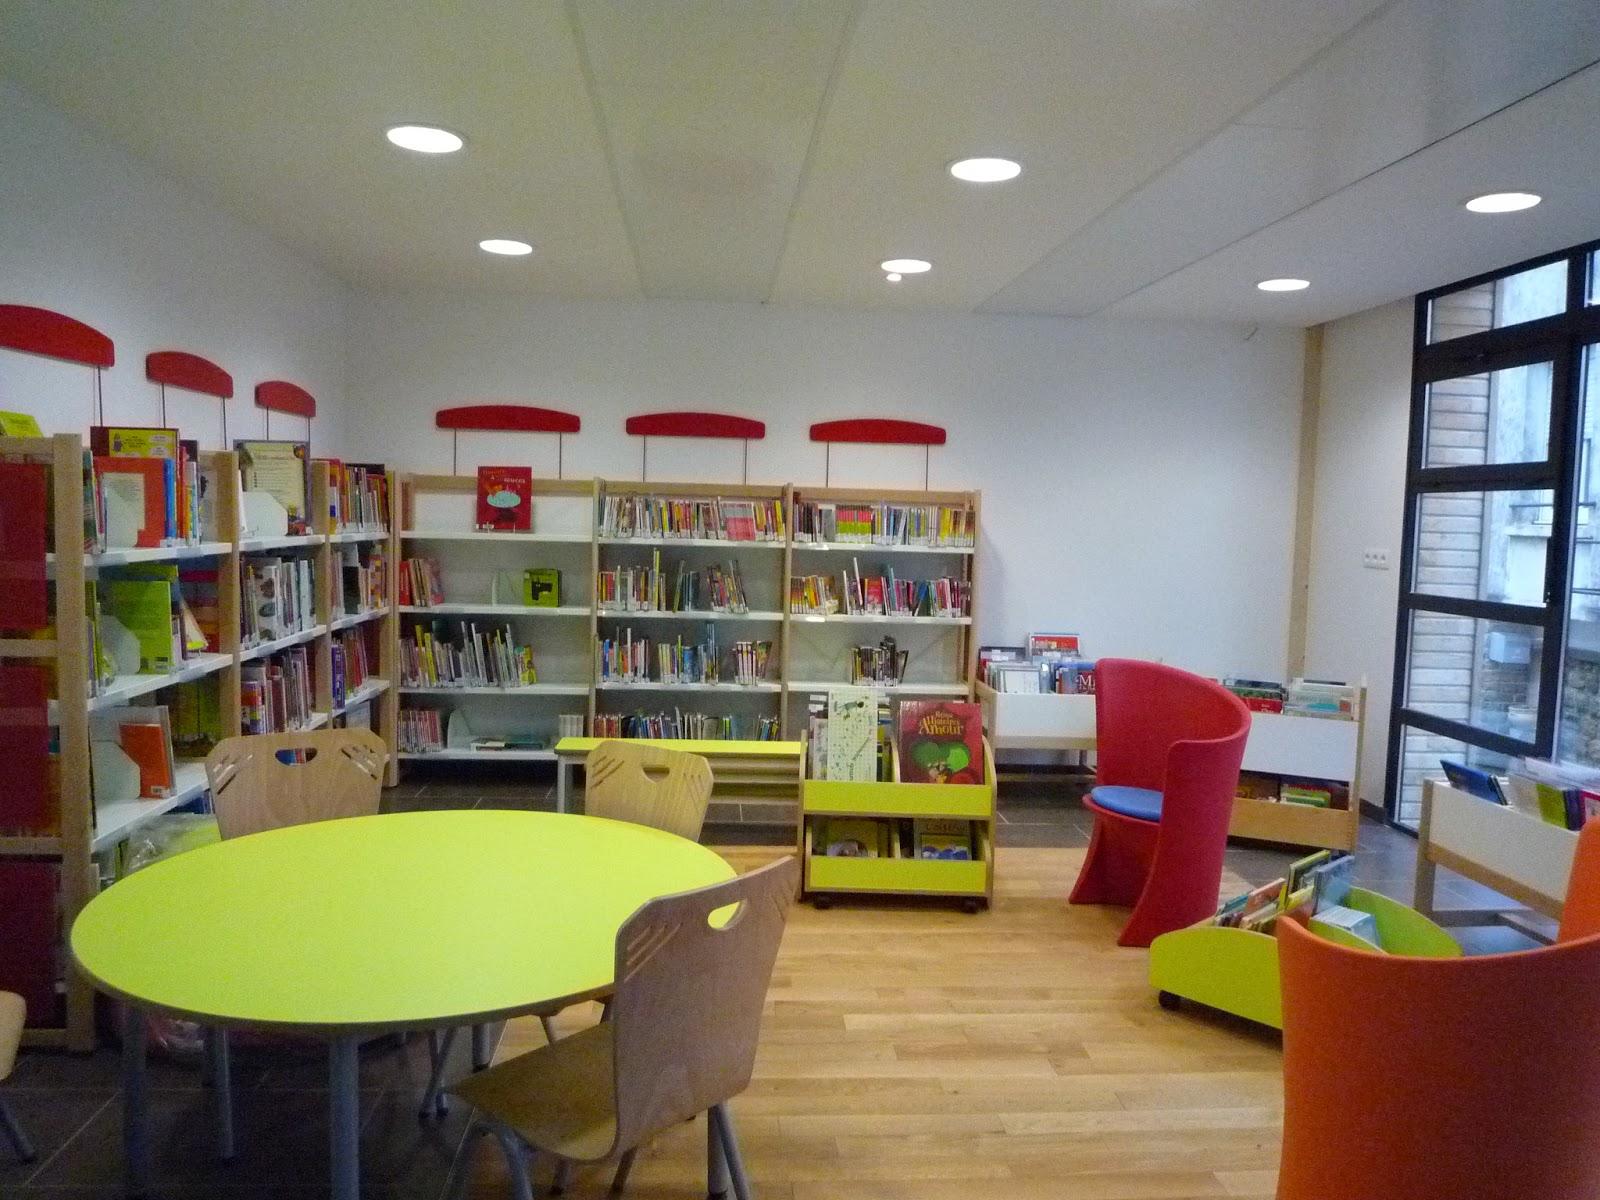 biblioth que m diath que de saint thurien novembre 2012. Black Bedroom Furniture Sets. Home Design Ideas